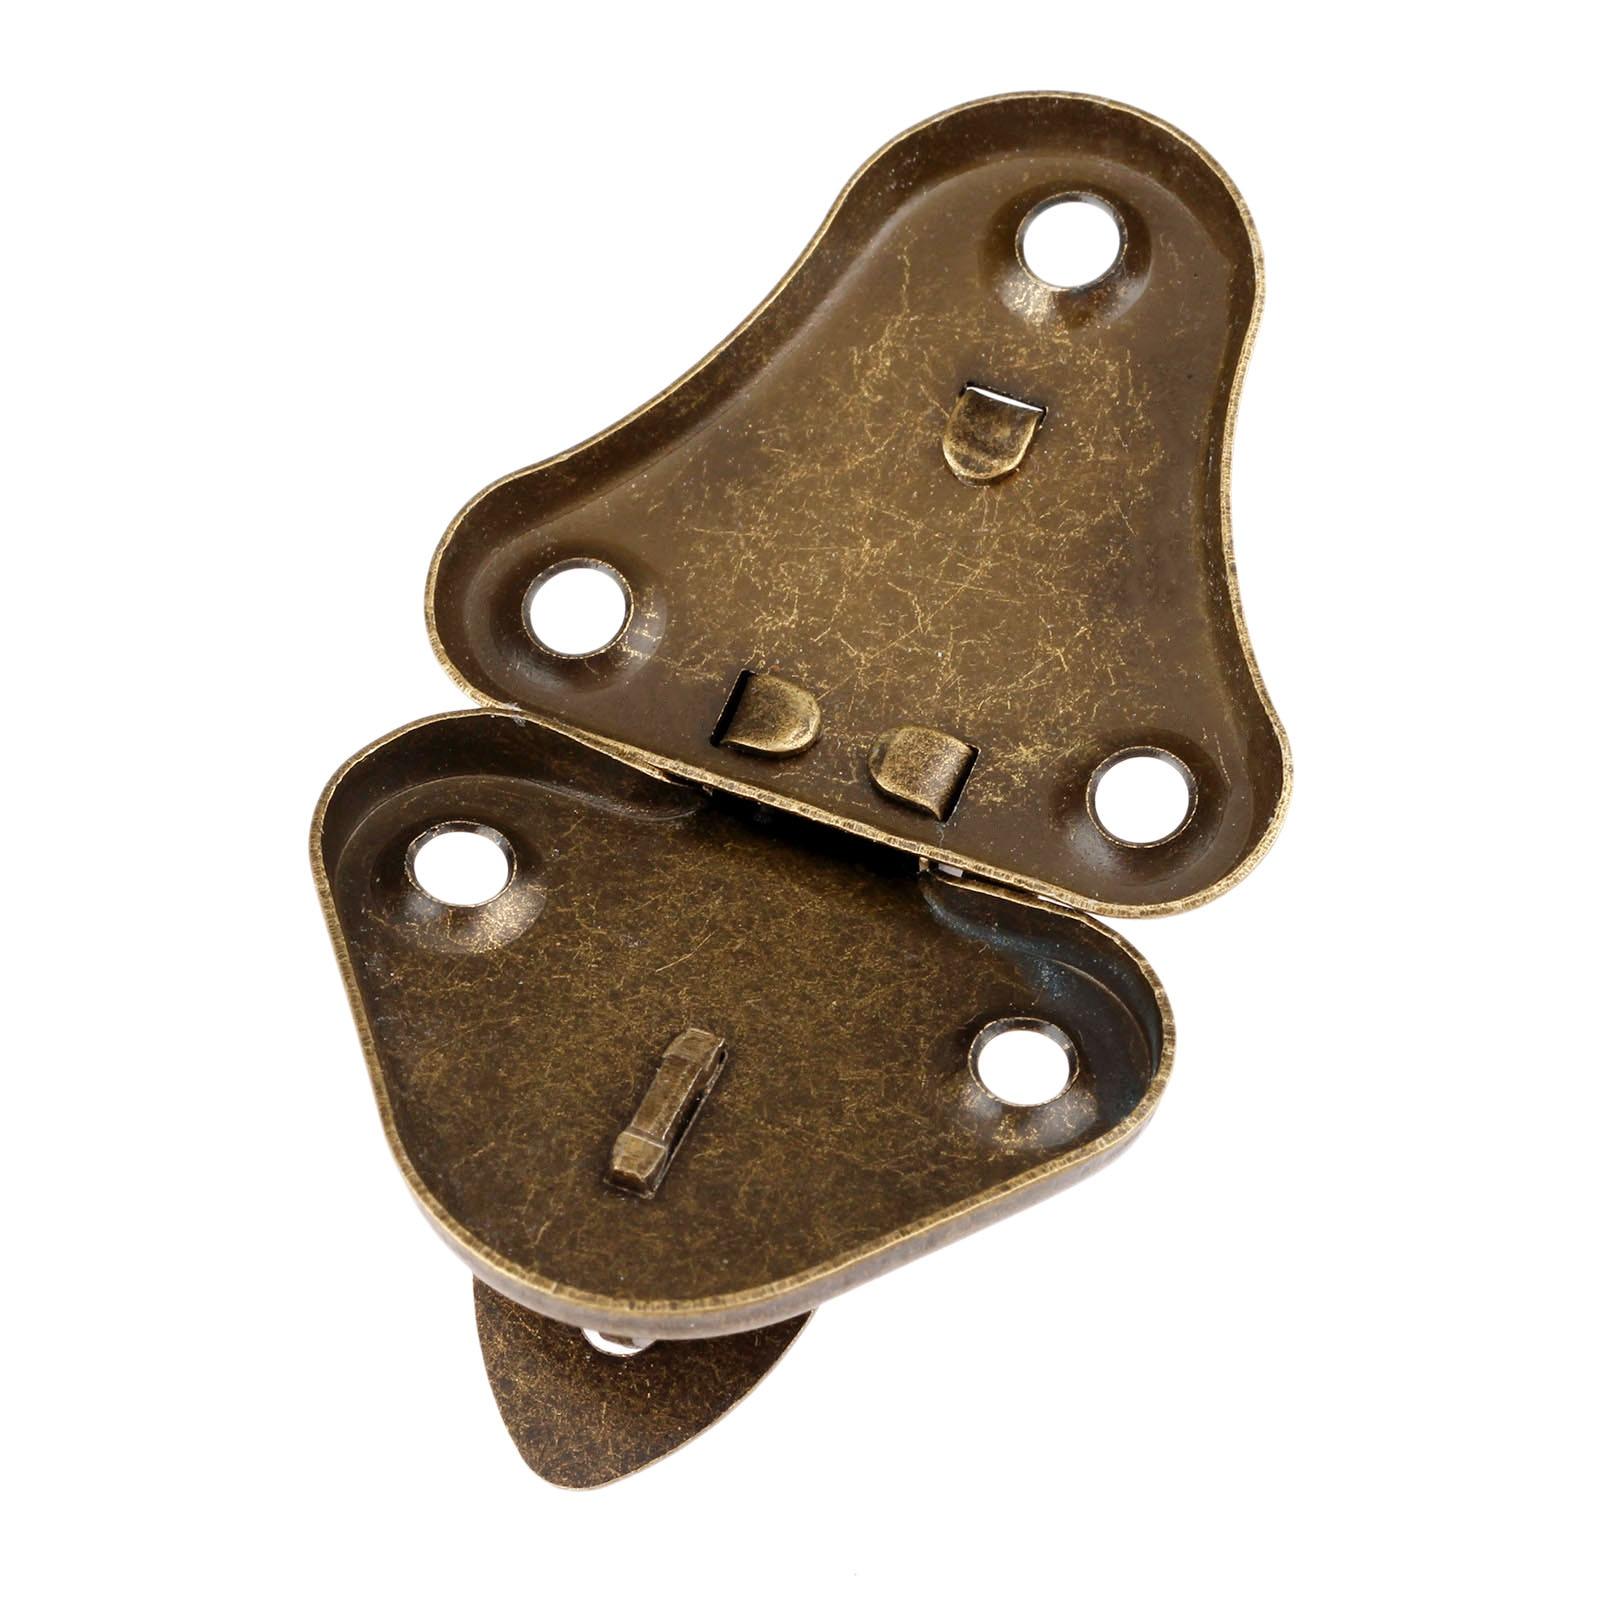 60mm Dia Toggle Latch Catch Trunk Lock Bronze Tone 2PCS for Chest Case Gift Box